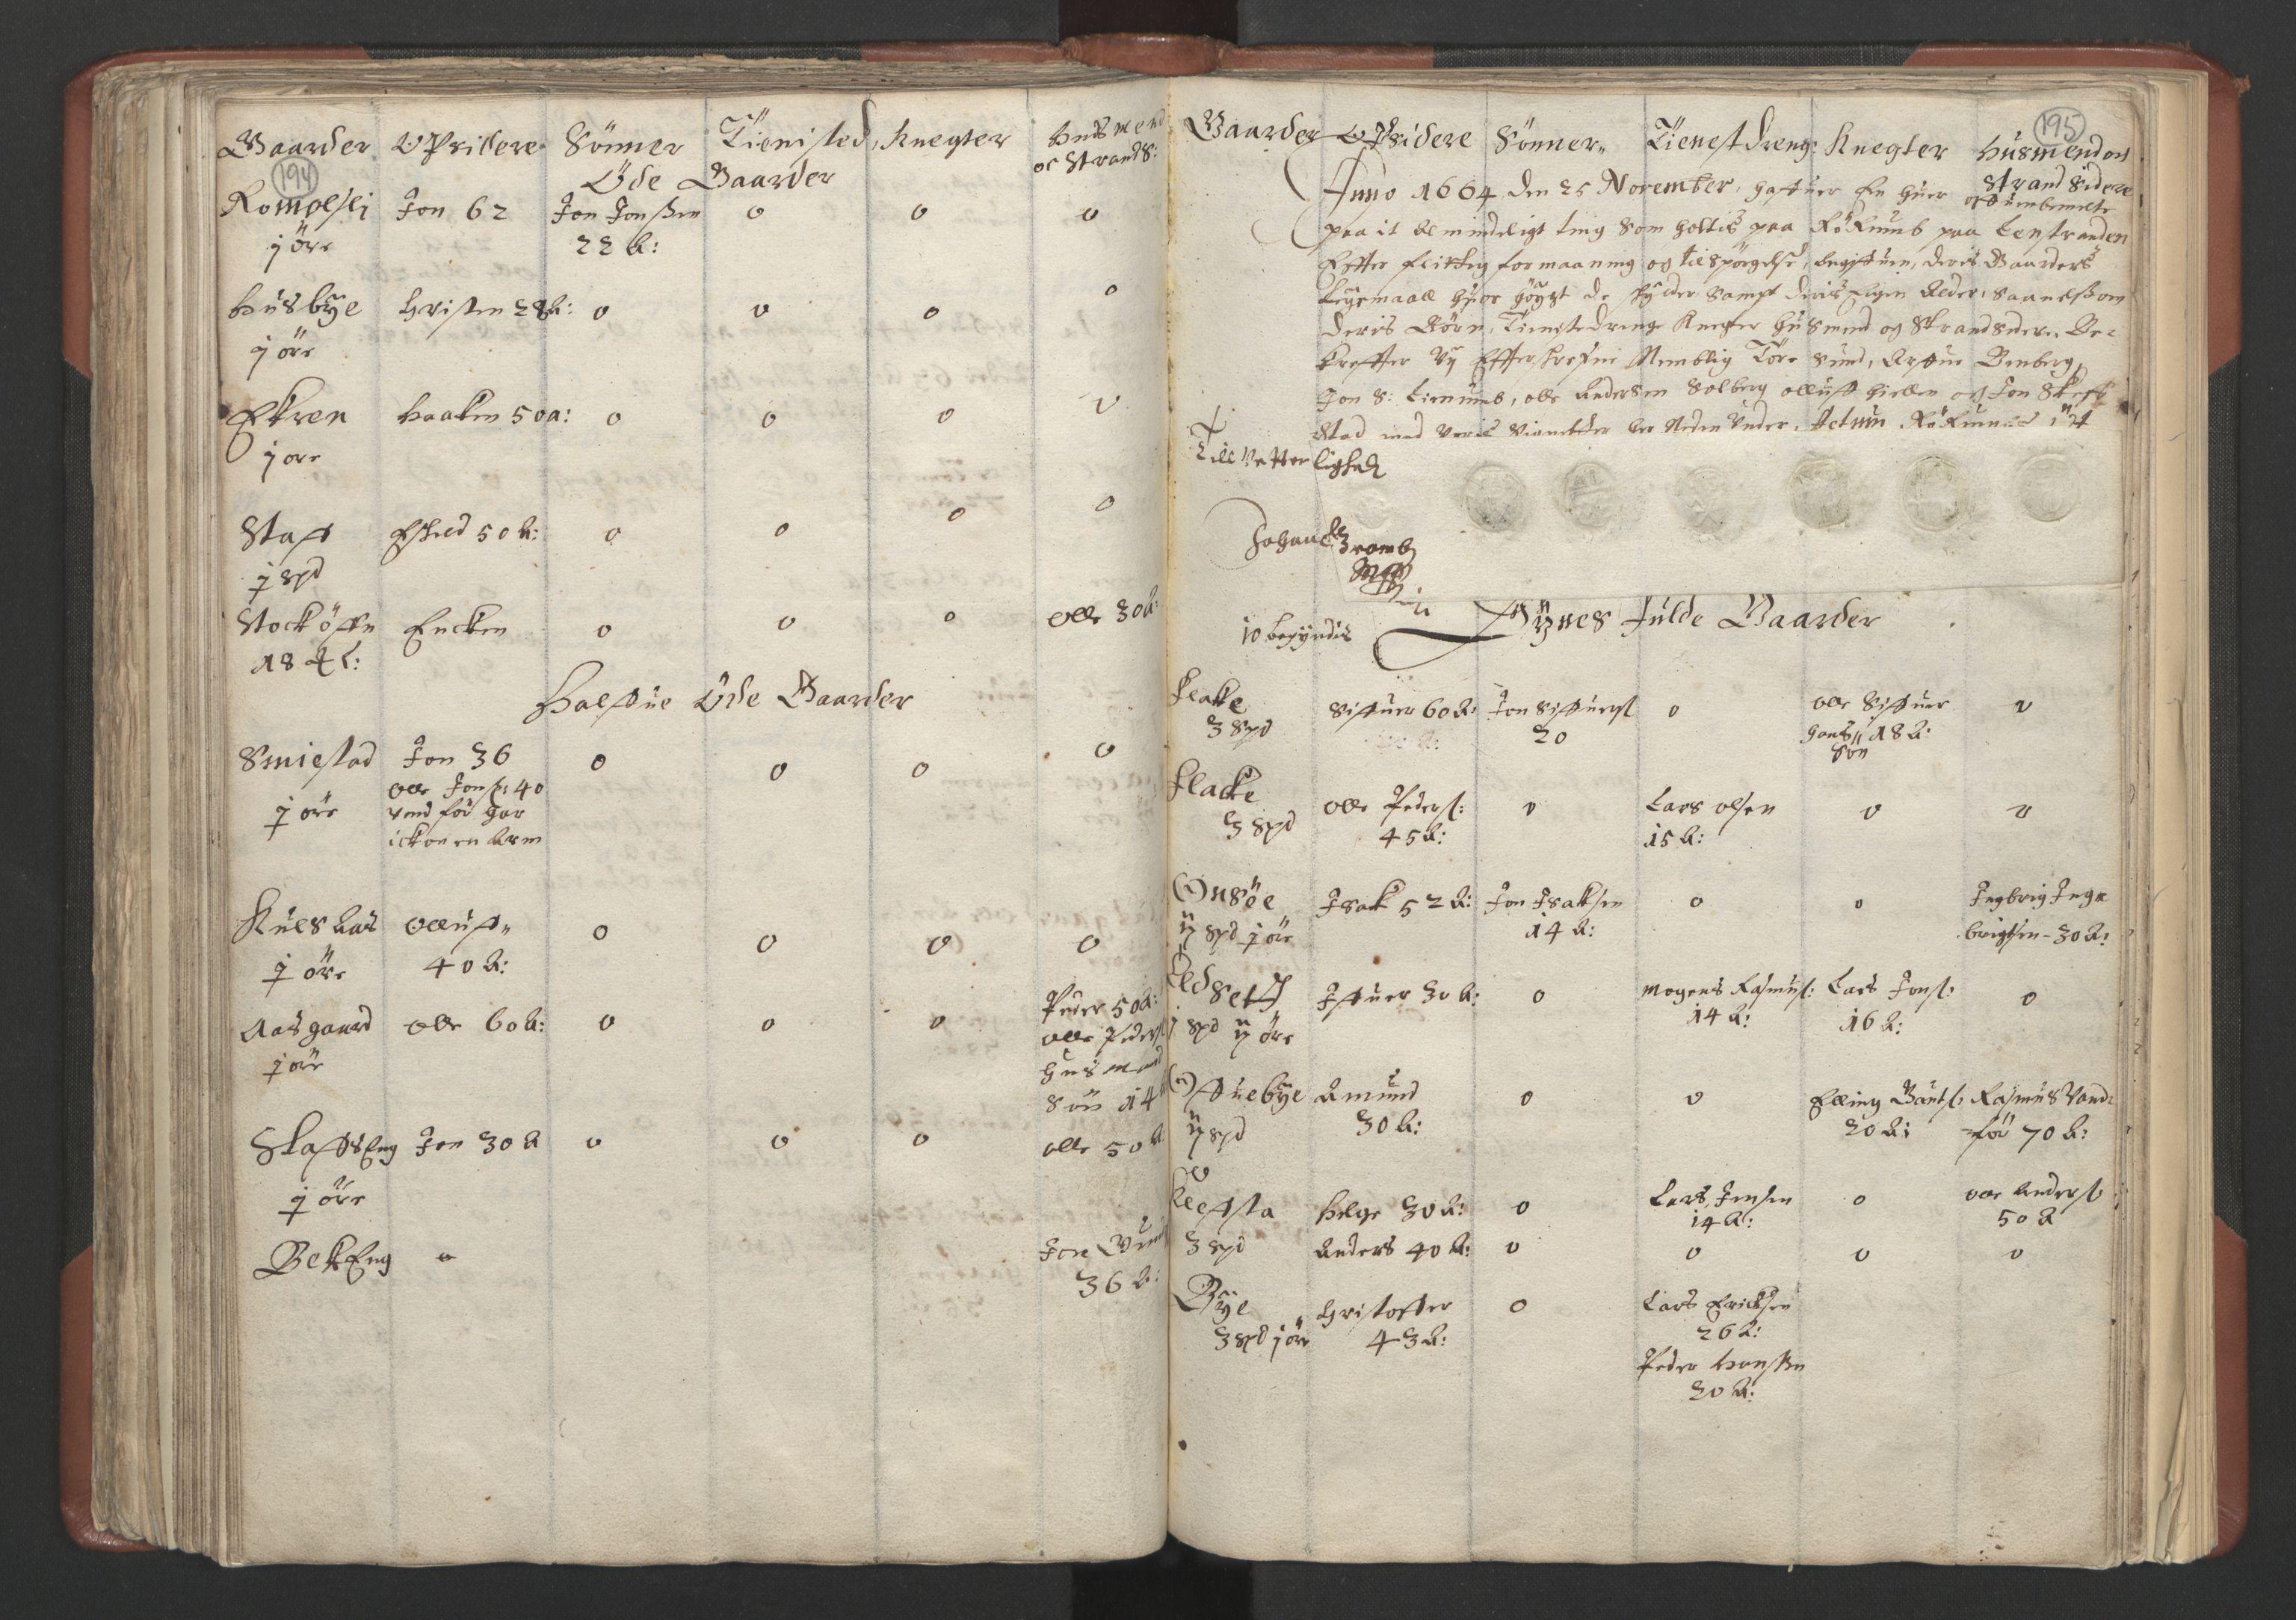 RA, Fogdenes og sorenskrivernes manntall 1664-1666, nr. 18: Gauldal fogderi, Strinda fogderi og Orkdal fogderi, 1664, s. 194-195